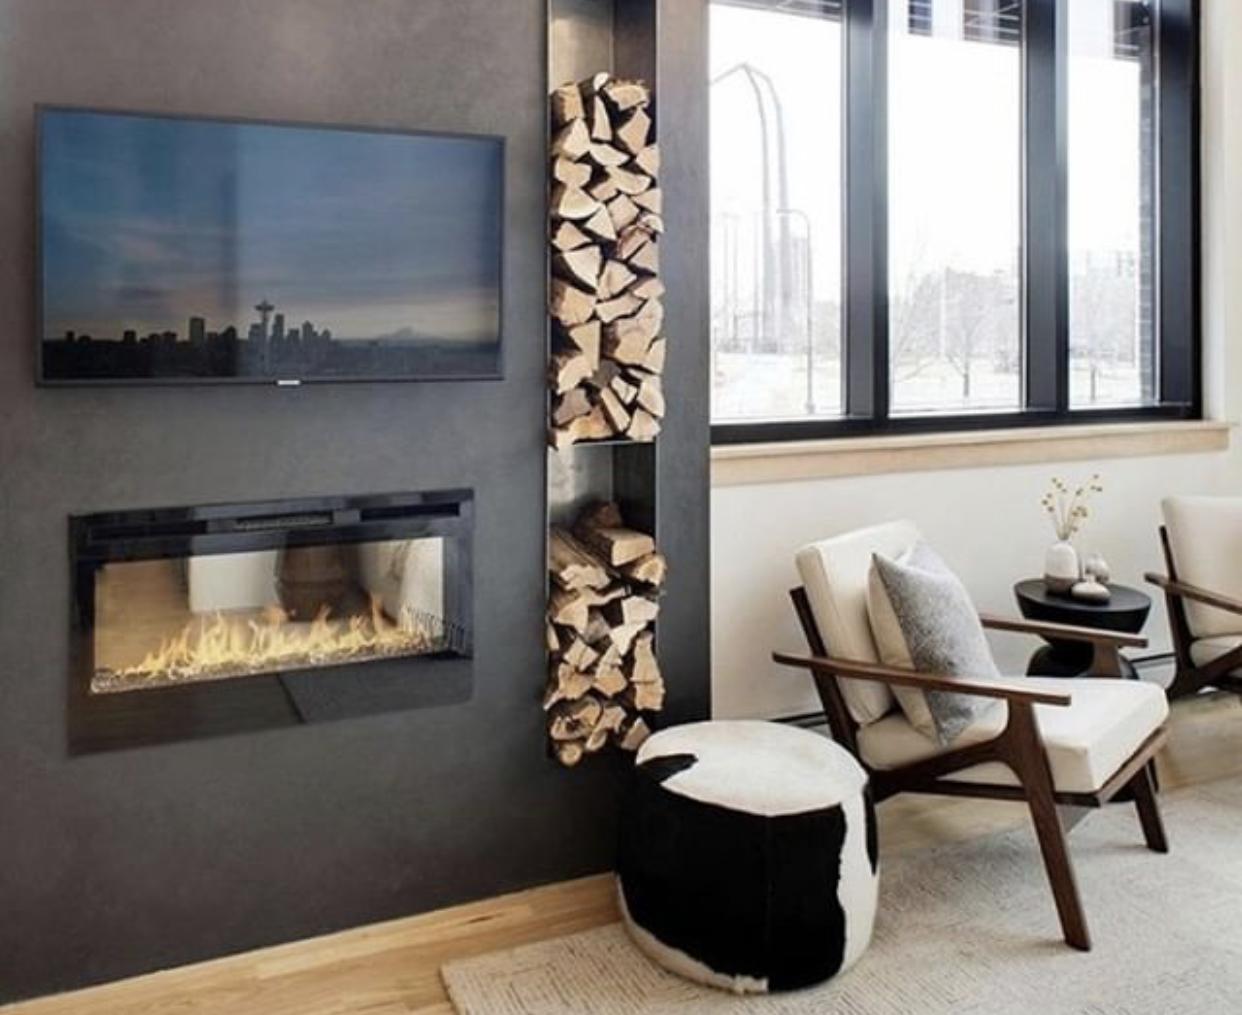 dimplex electric fireplace halifax nova scotia